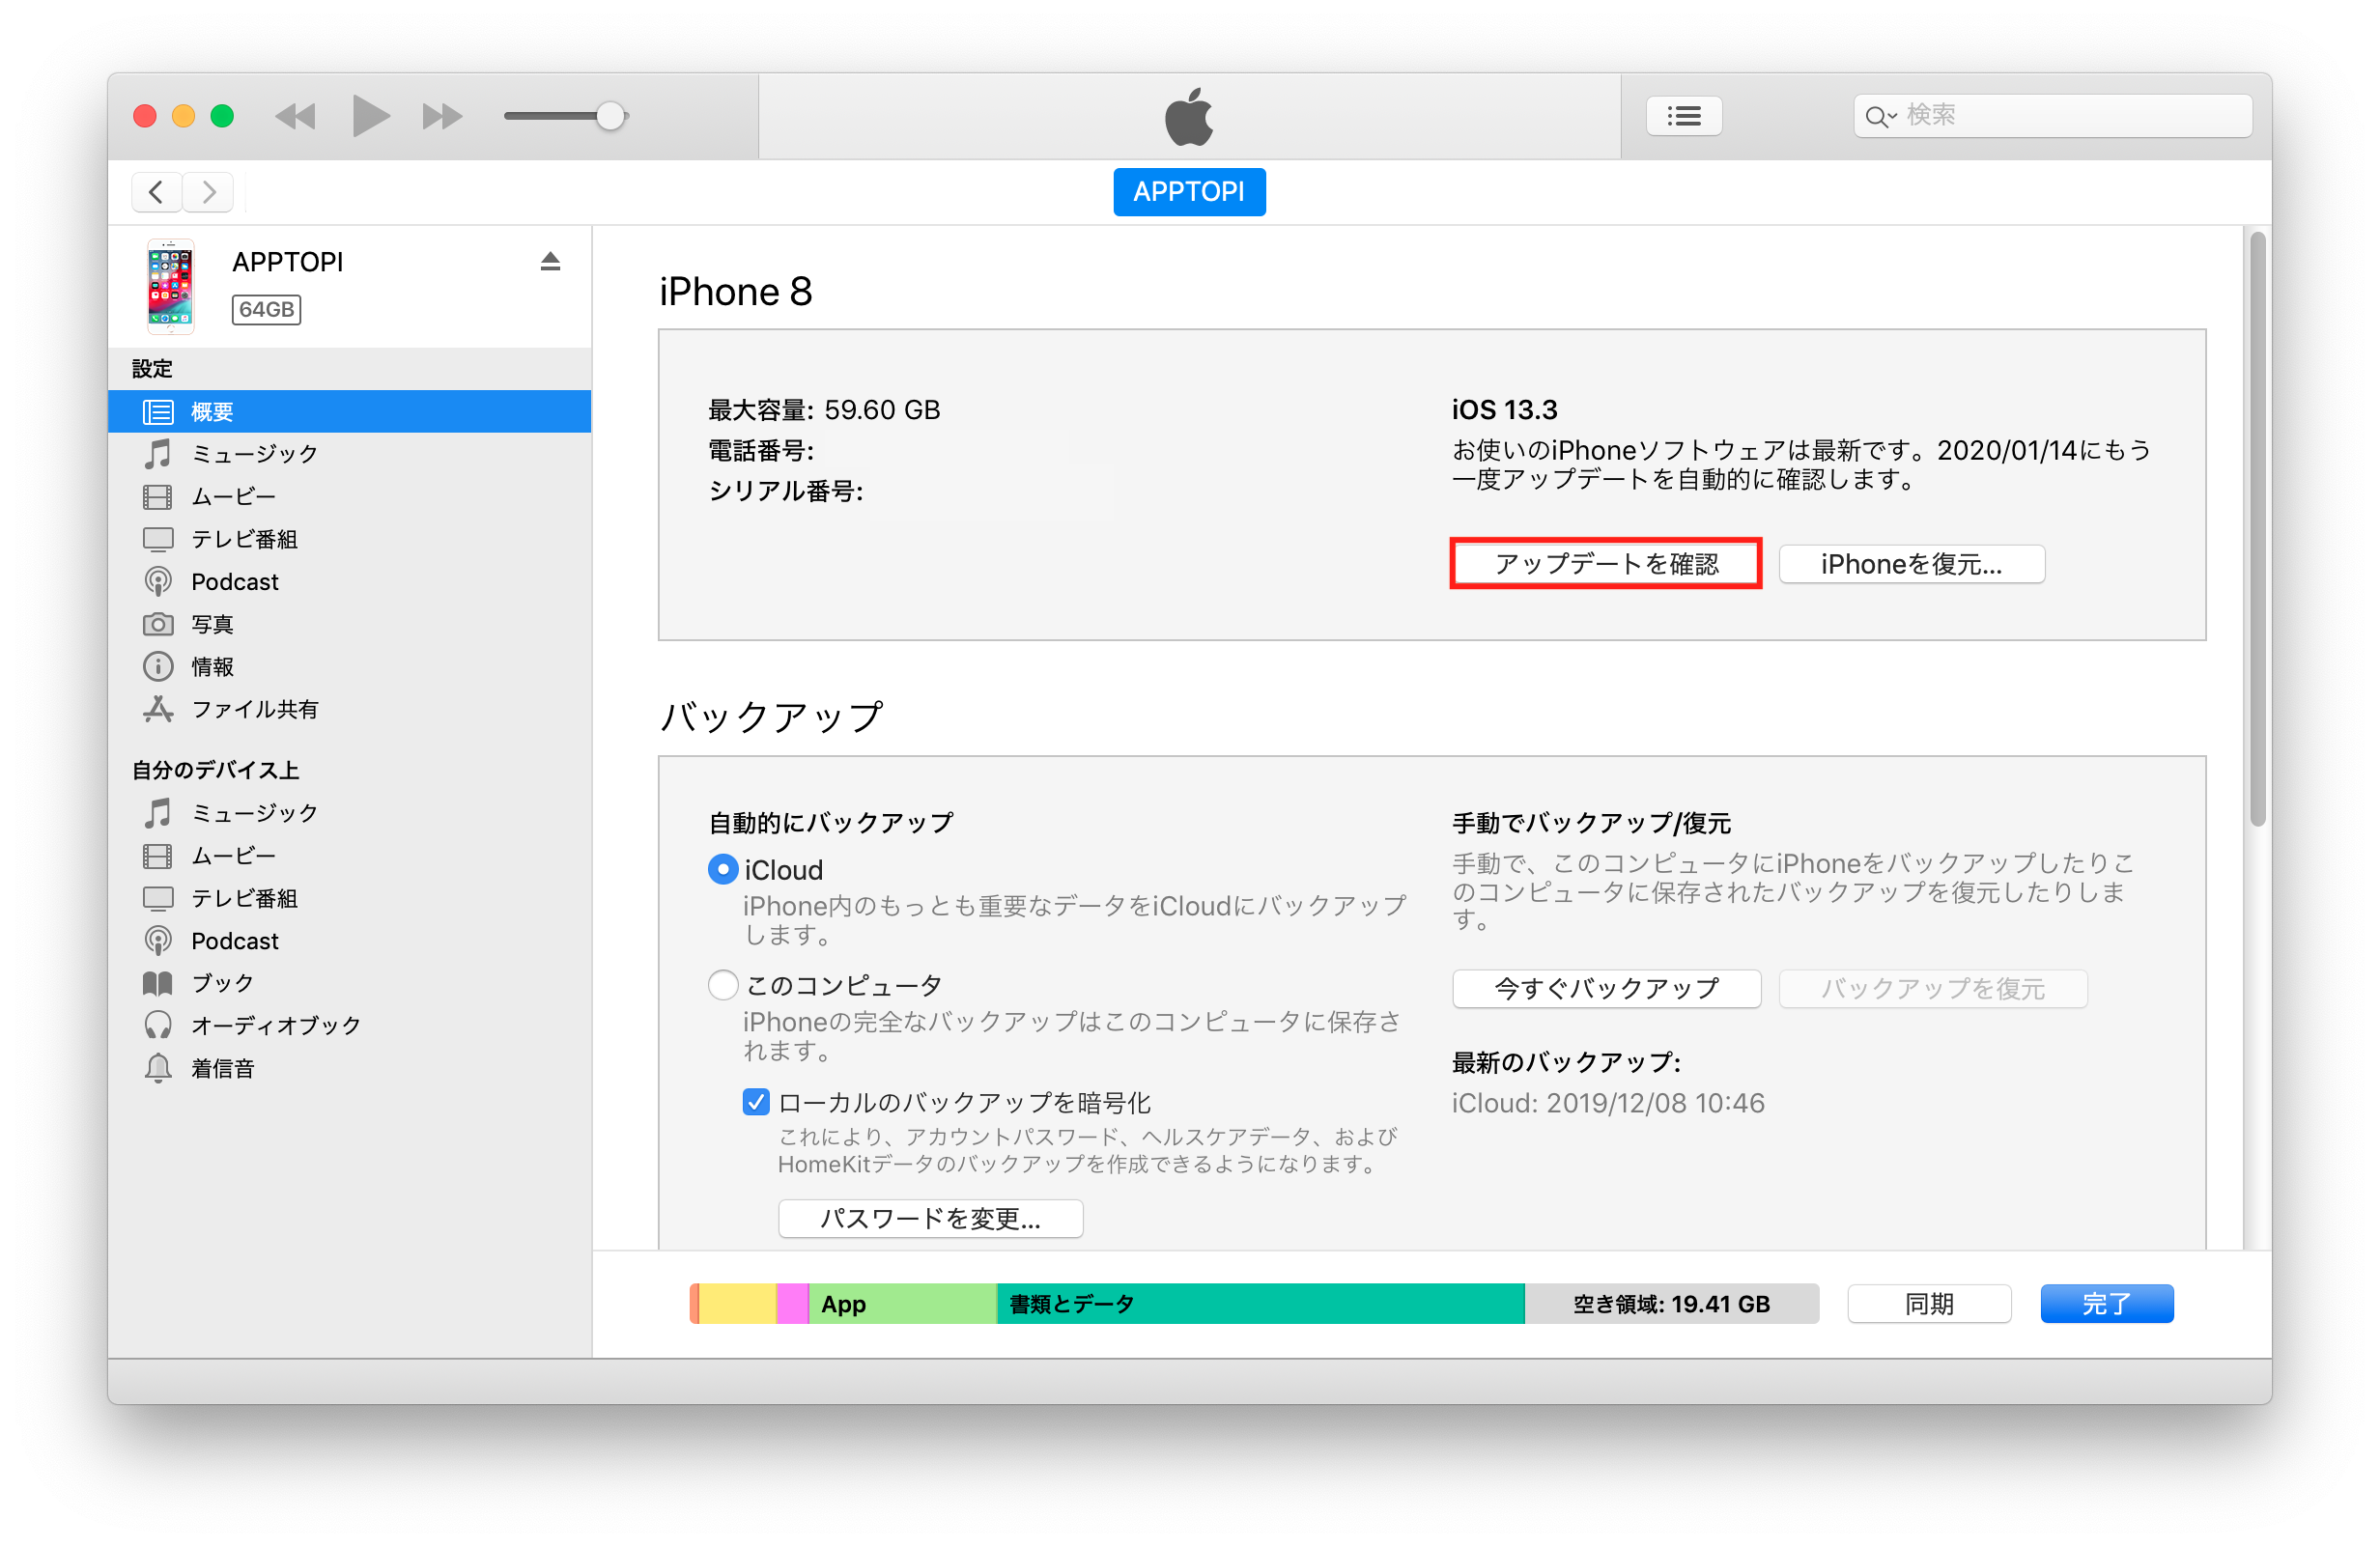 iTunes手動アップロード2